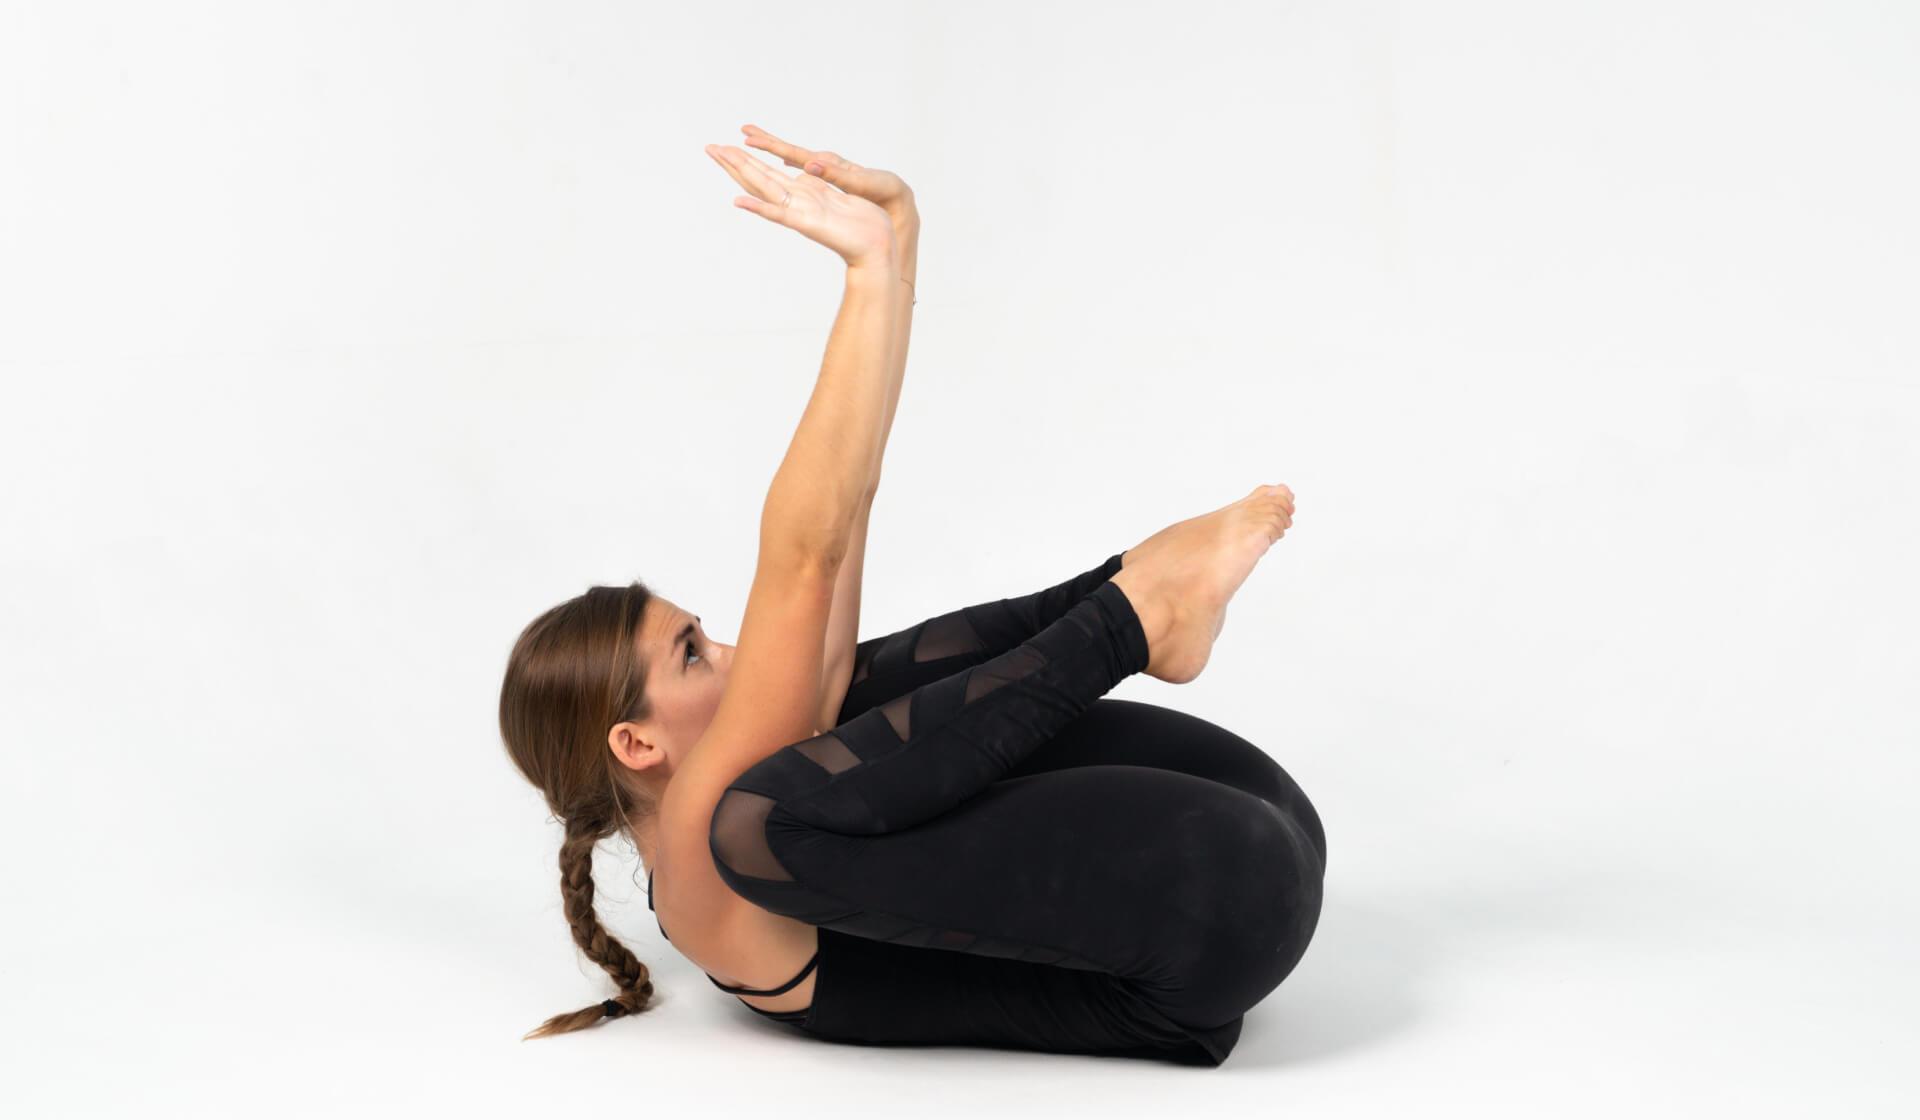 Bakasana These 50 Prep Poses Will Help You Master Crow Pose